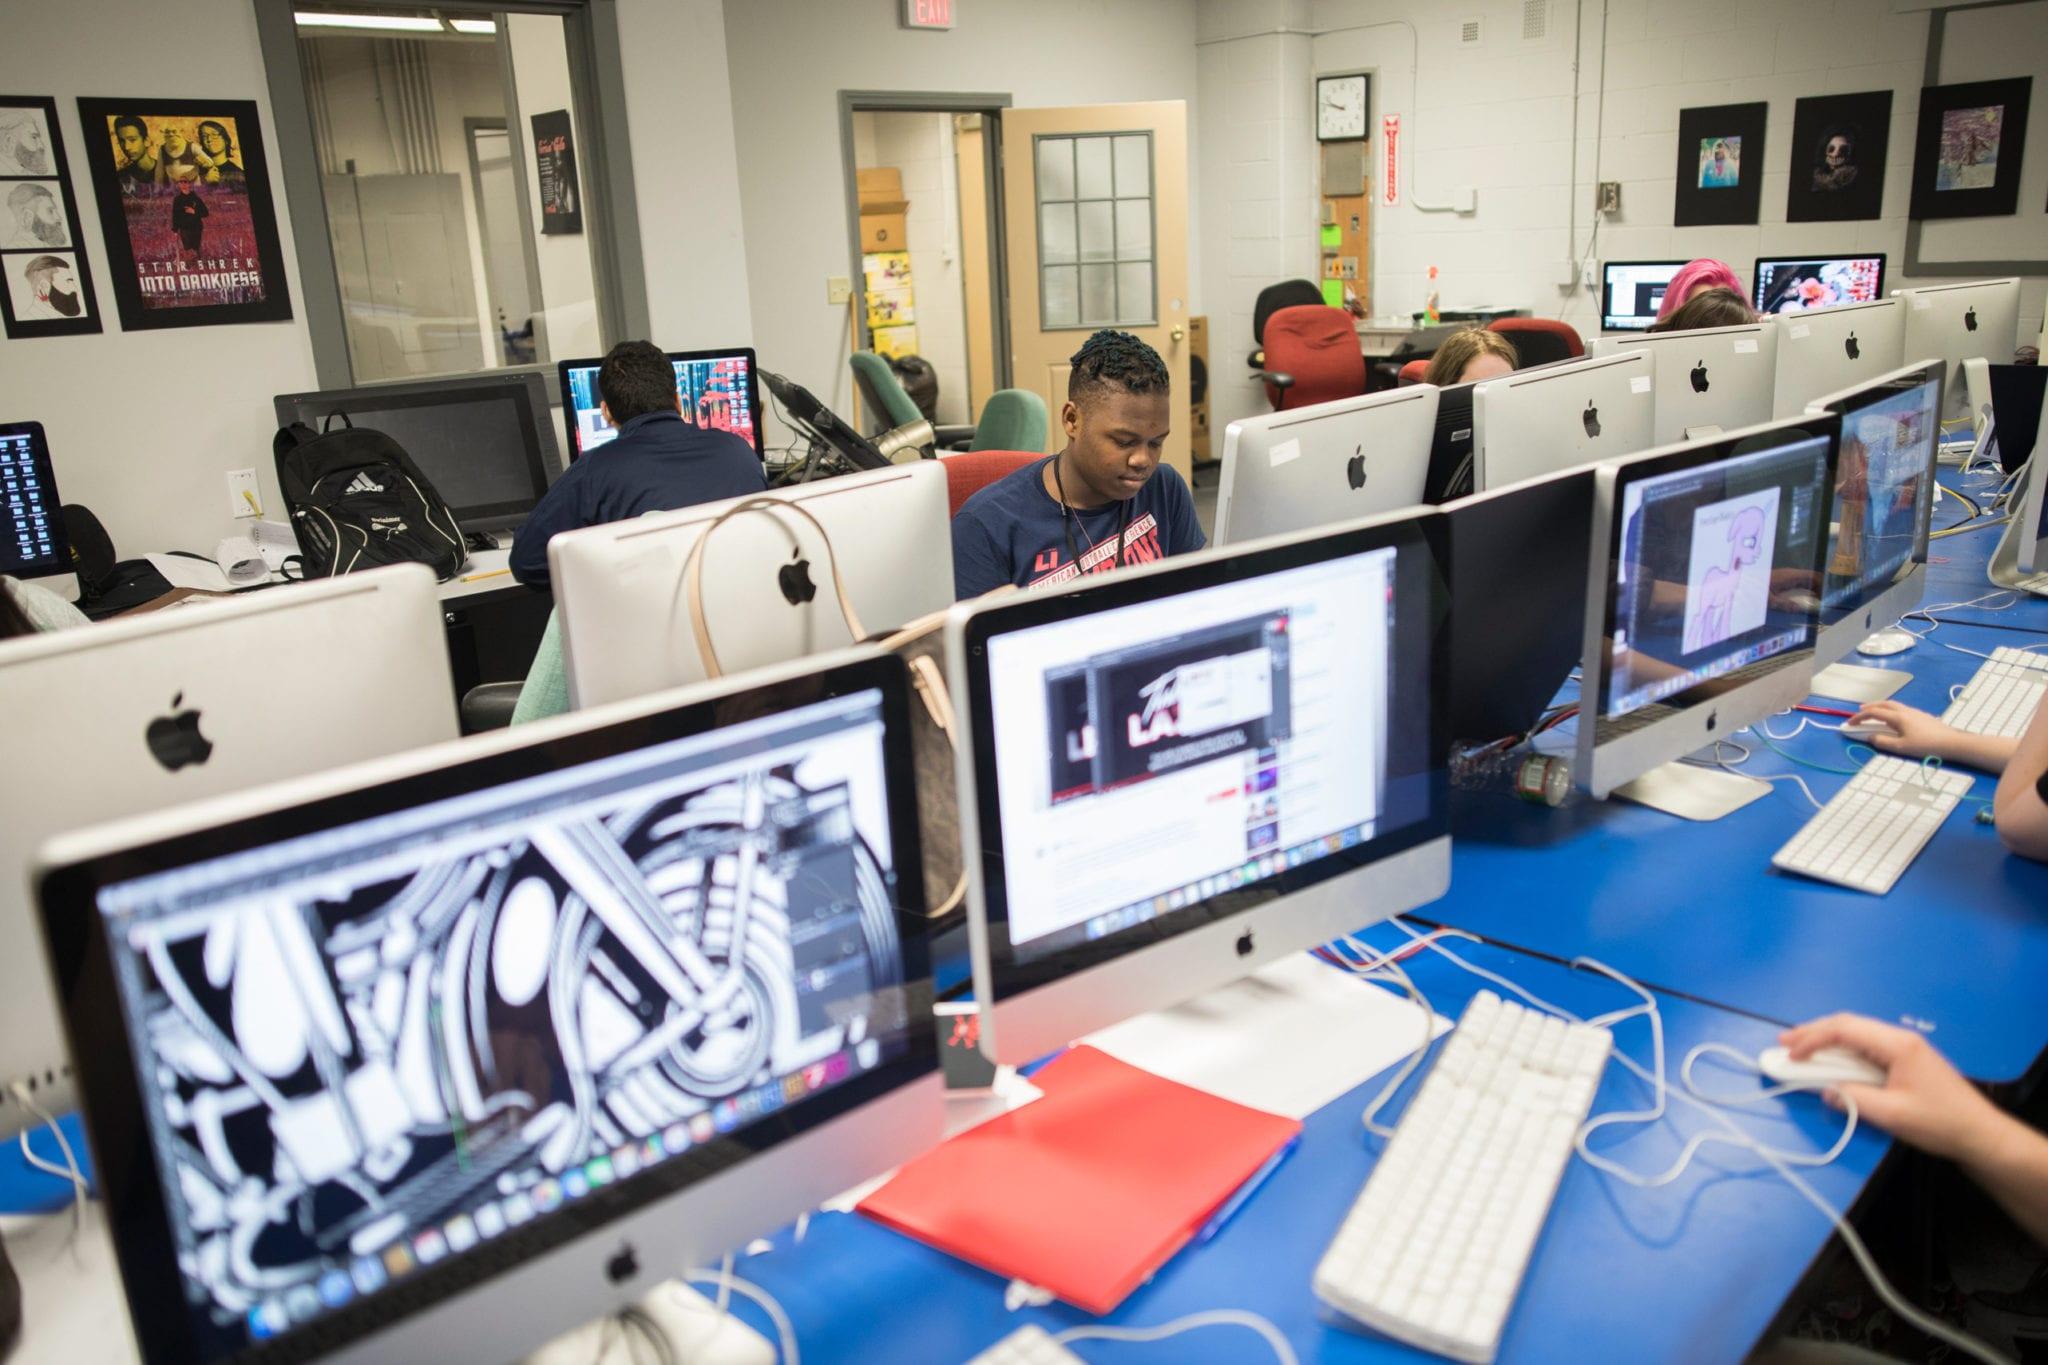 Design And Visual Communications Northeast Metropolitan Regional Vocational High School